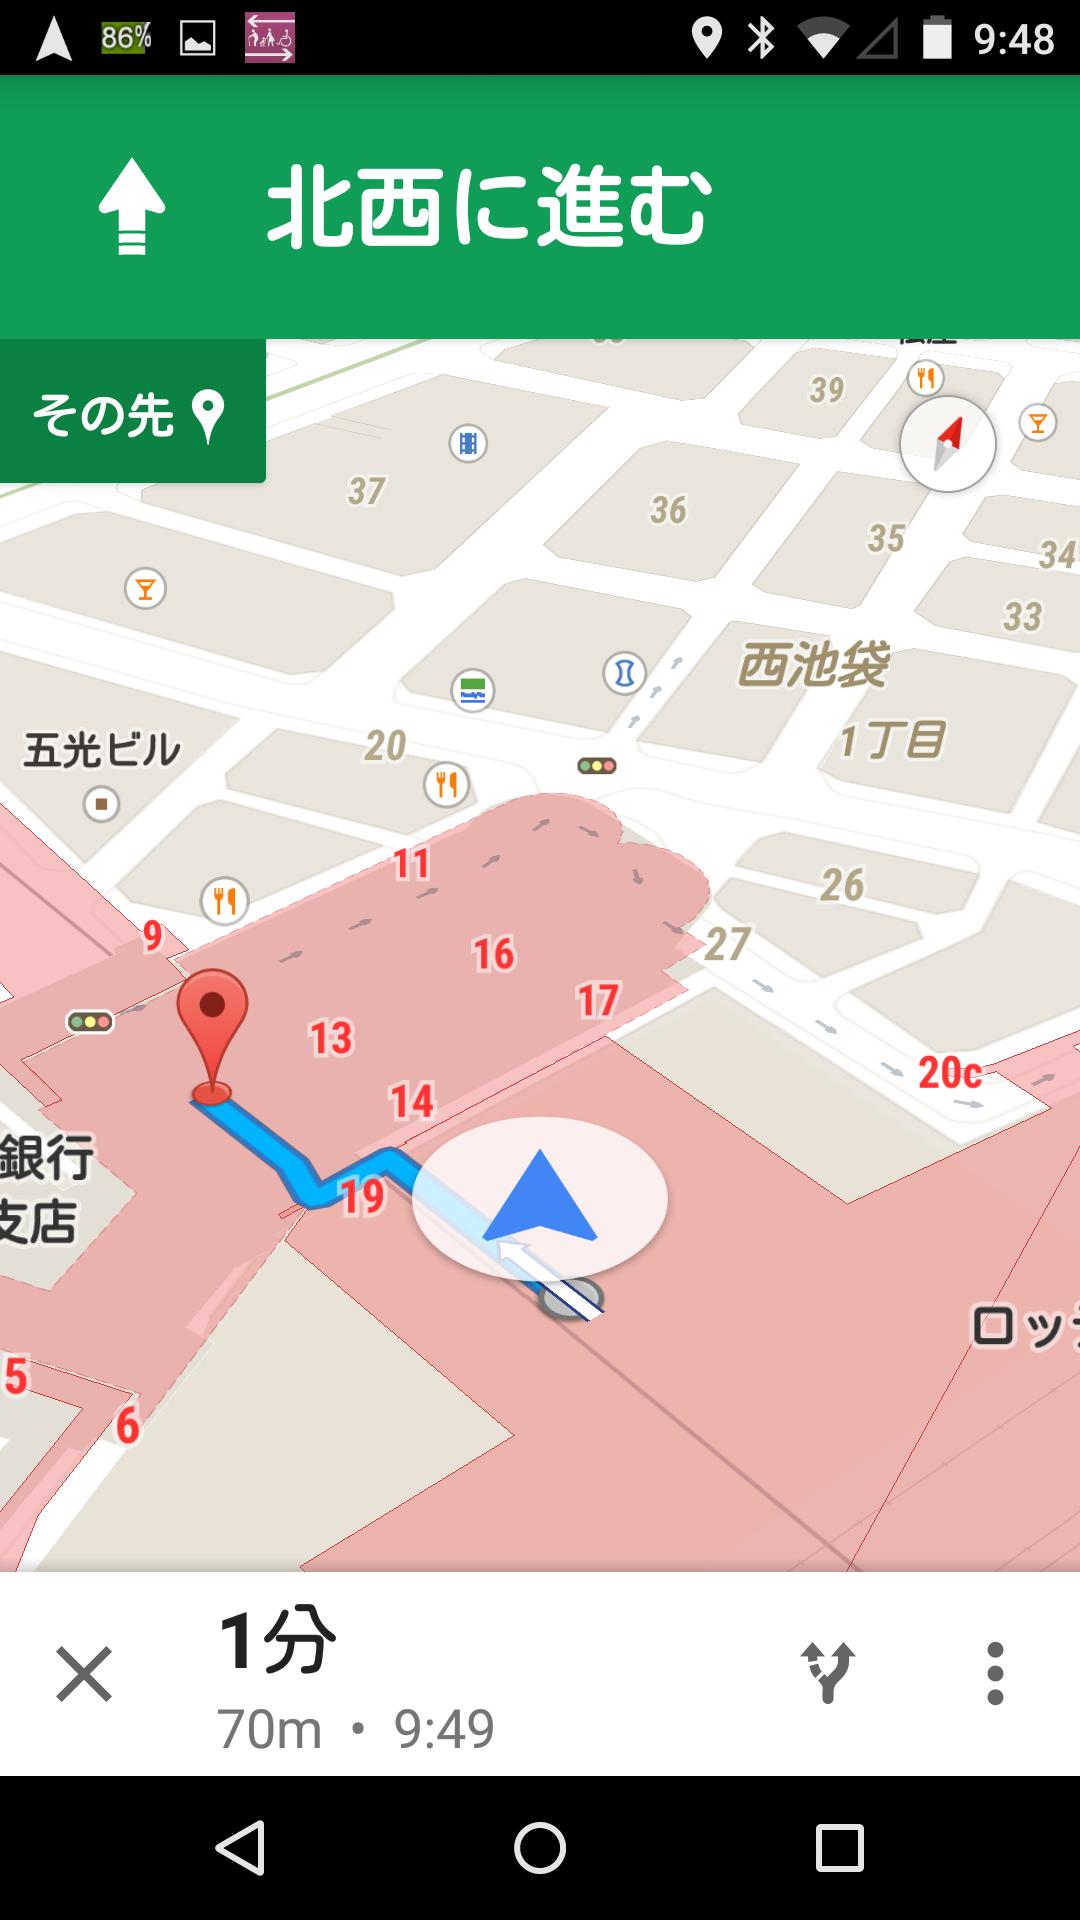 Google マップの屋内ナビ機能と連動